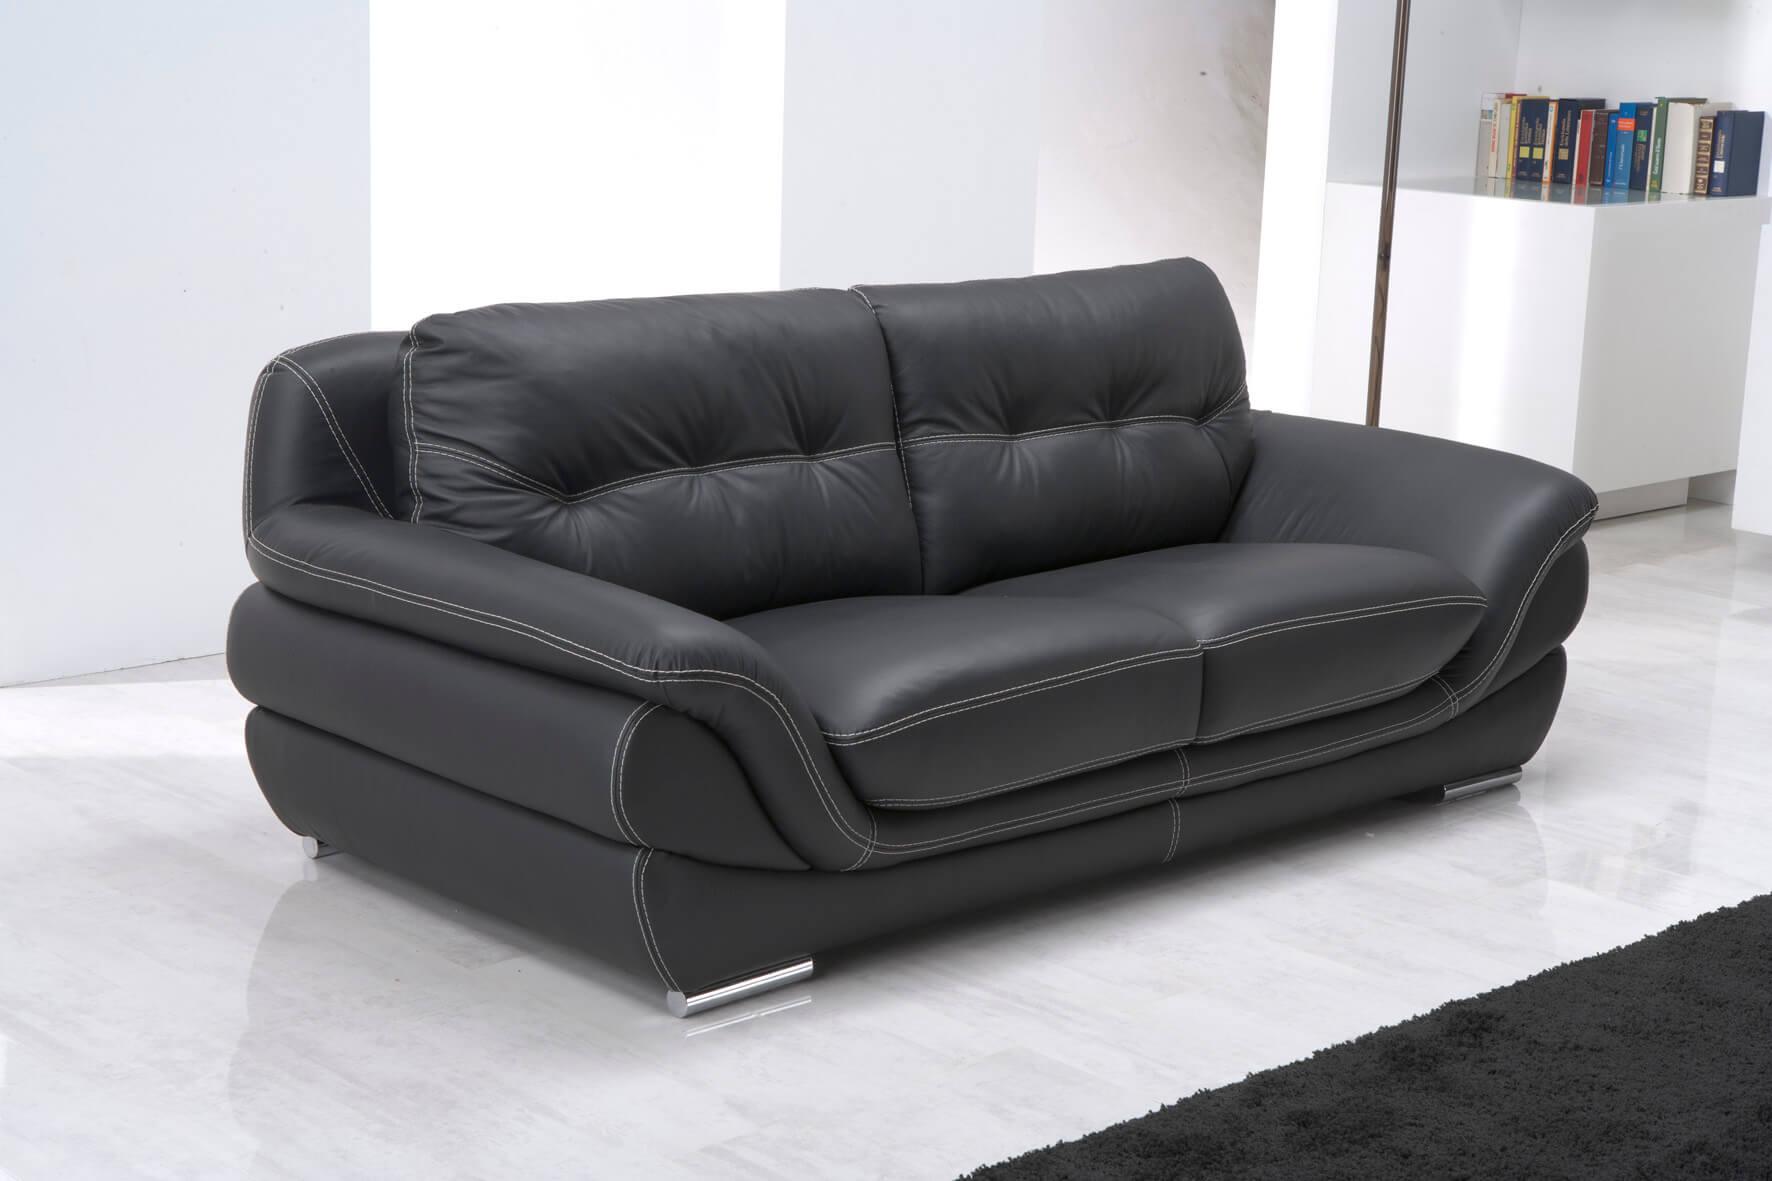 alice sofa giotto living sofa relax sofa ange sofa sofabed